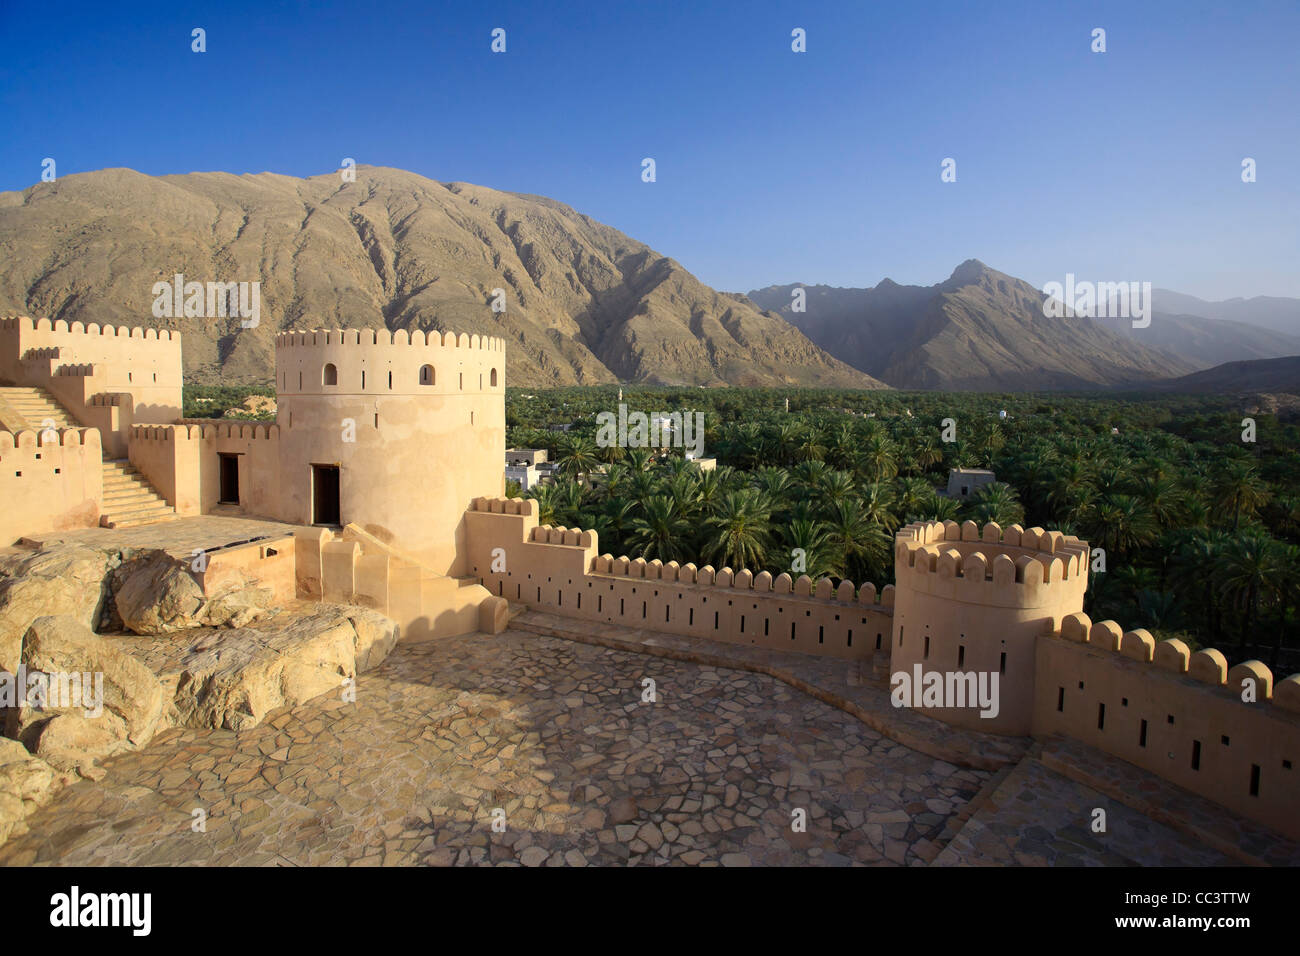 Oman, Nakhal, Nakhal Fort Immagini Stock